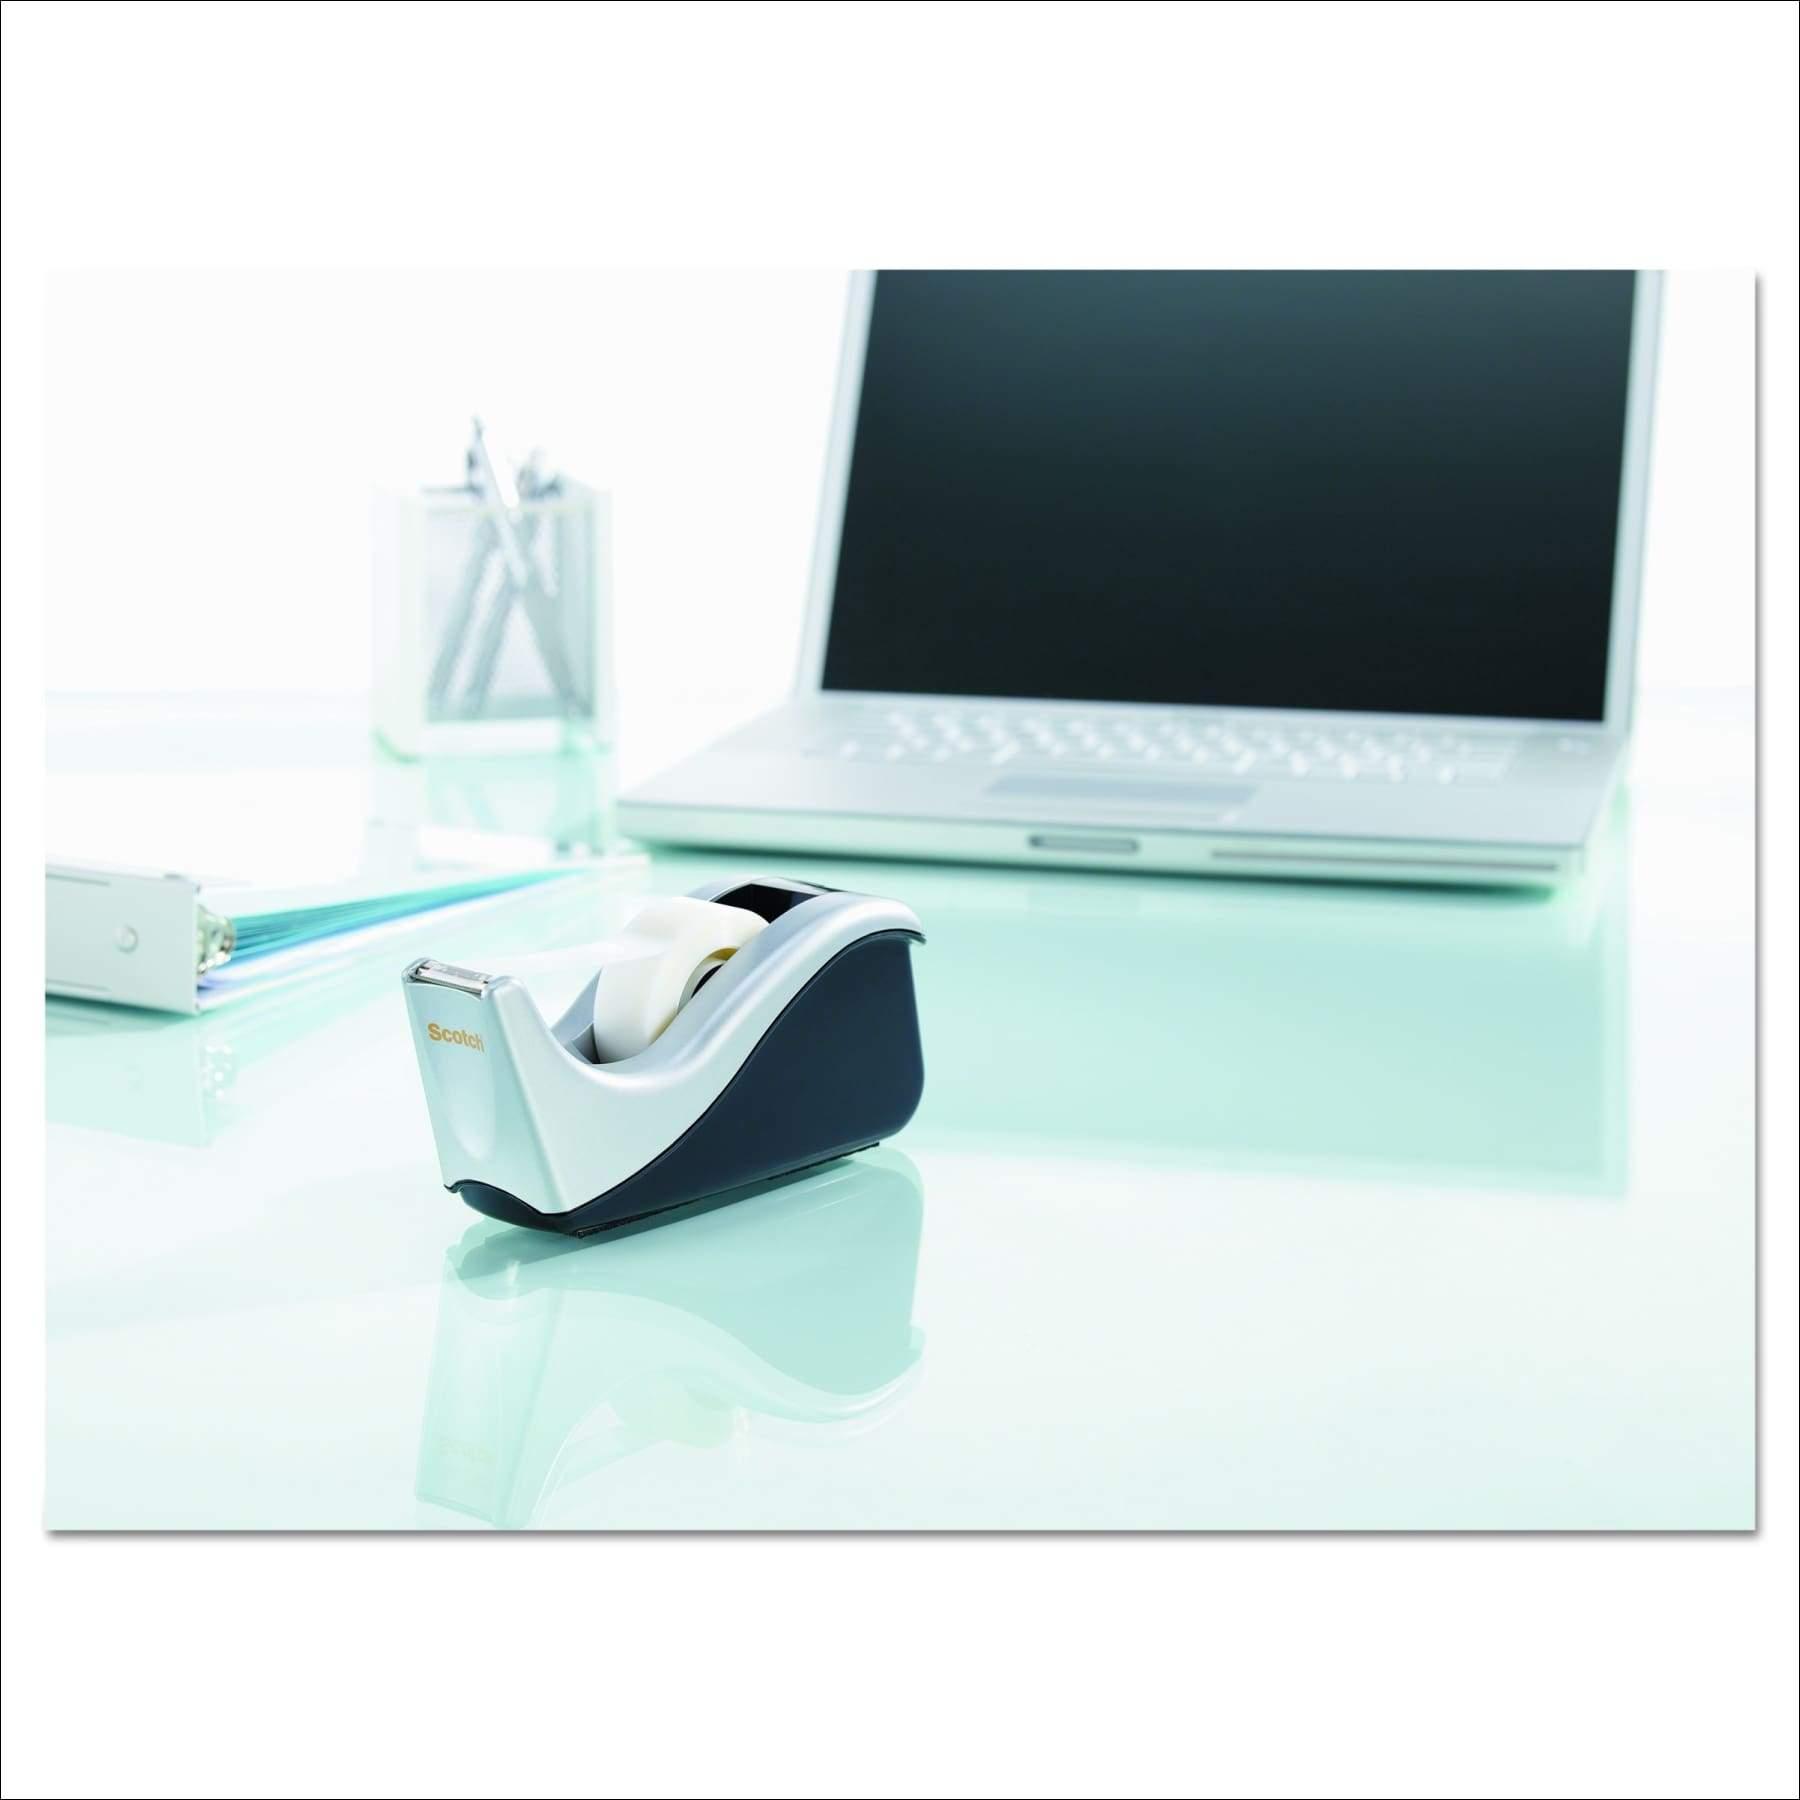 Black//Silver Two-Tone Scotch Desktop Tape Dispenser Silvertech C60-St 3 Pack